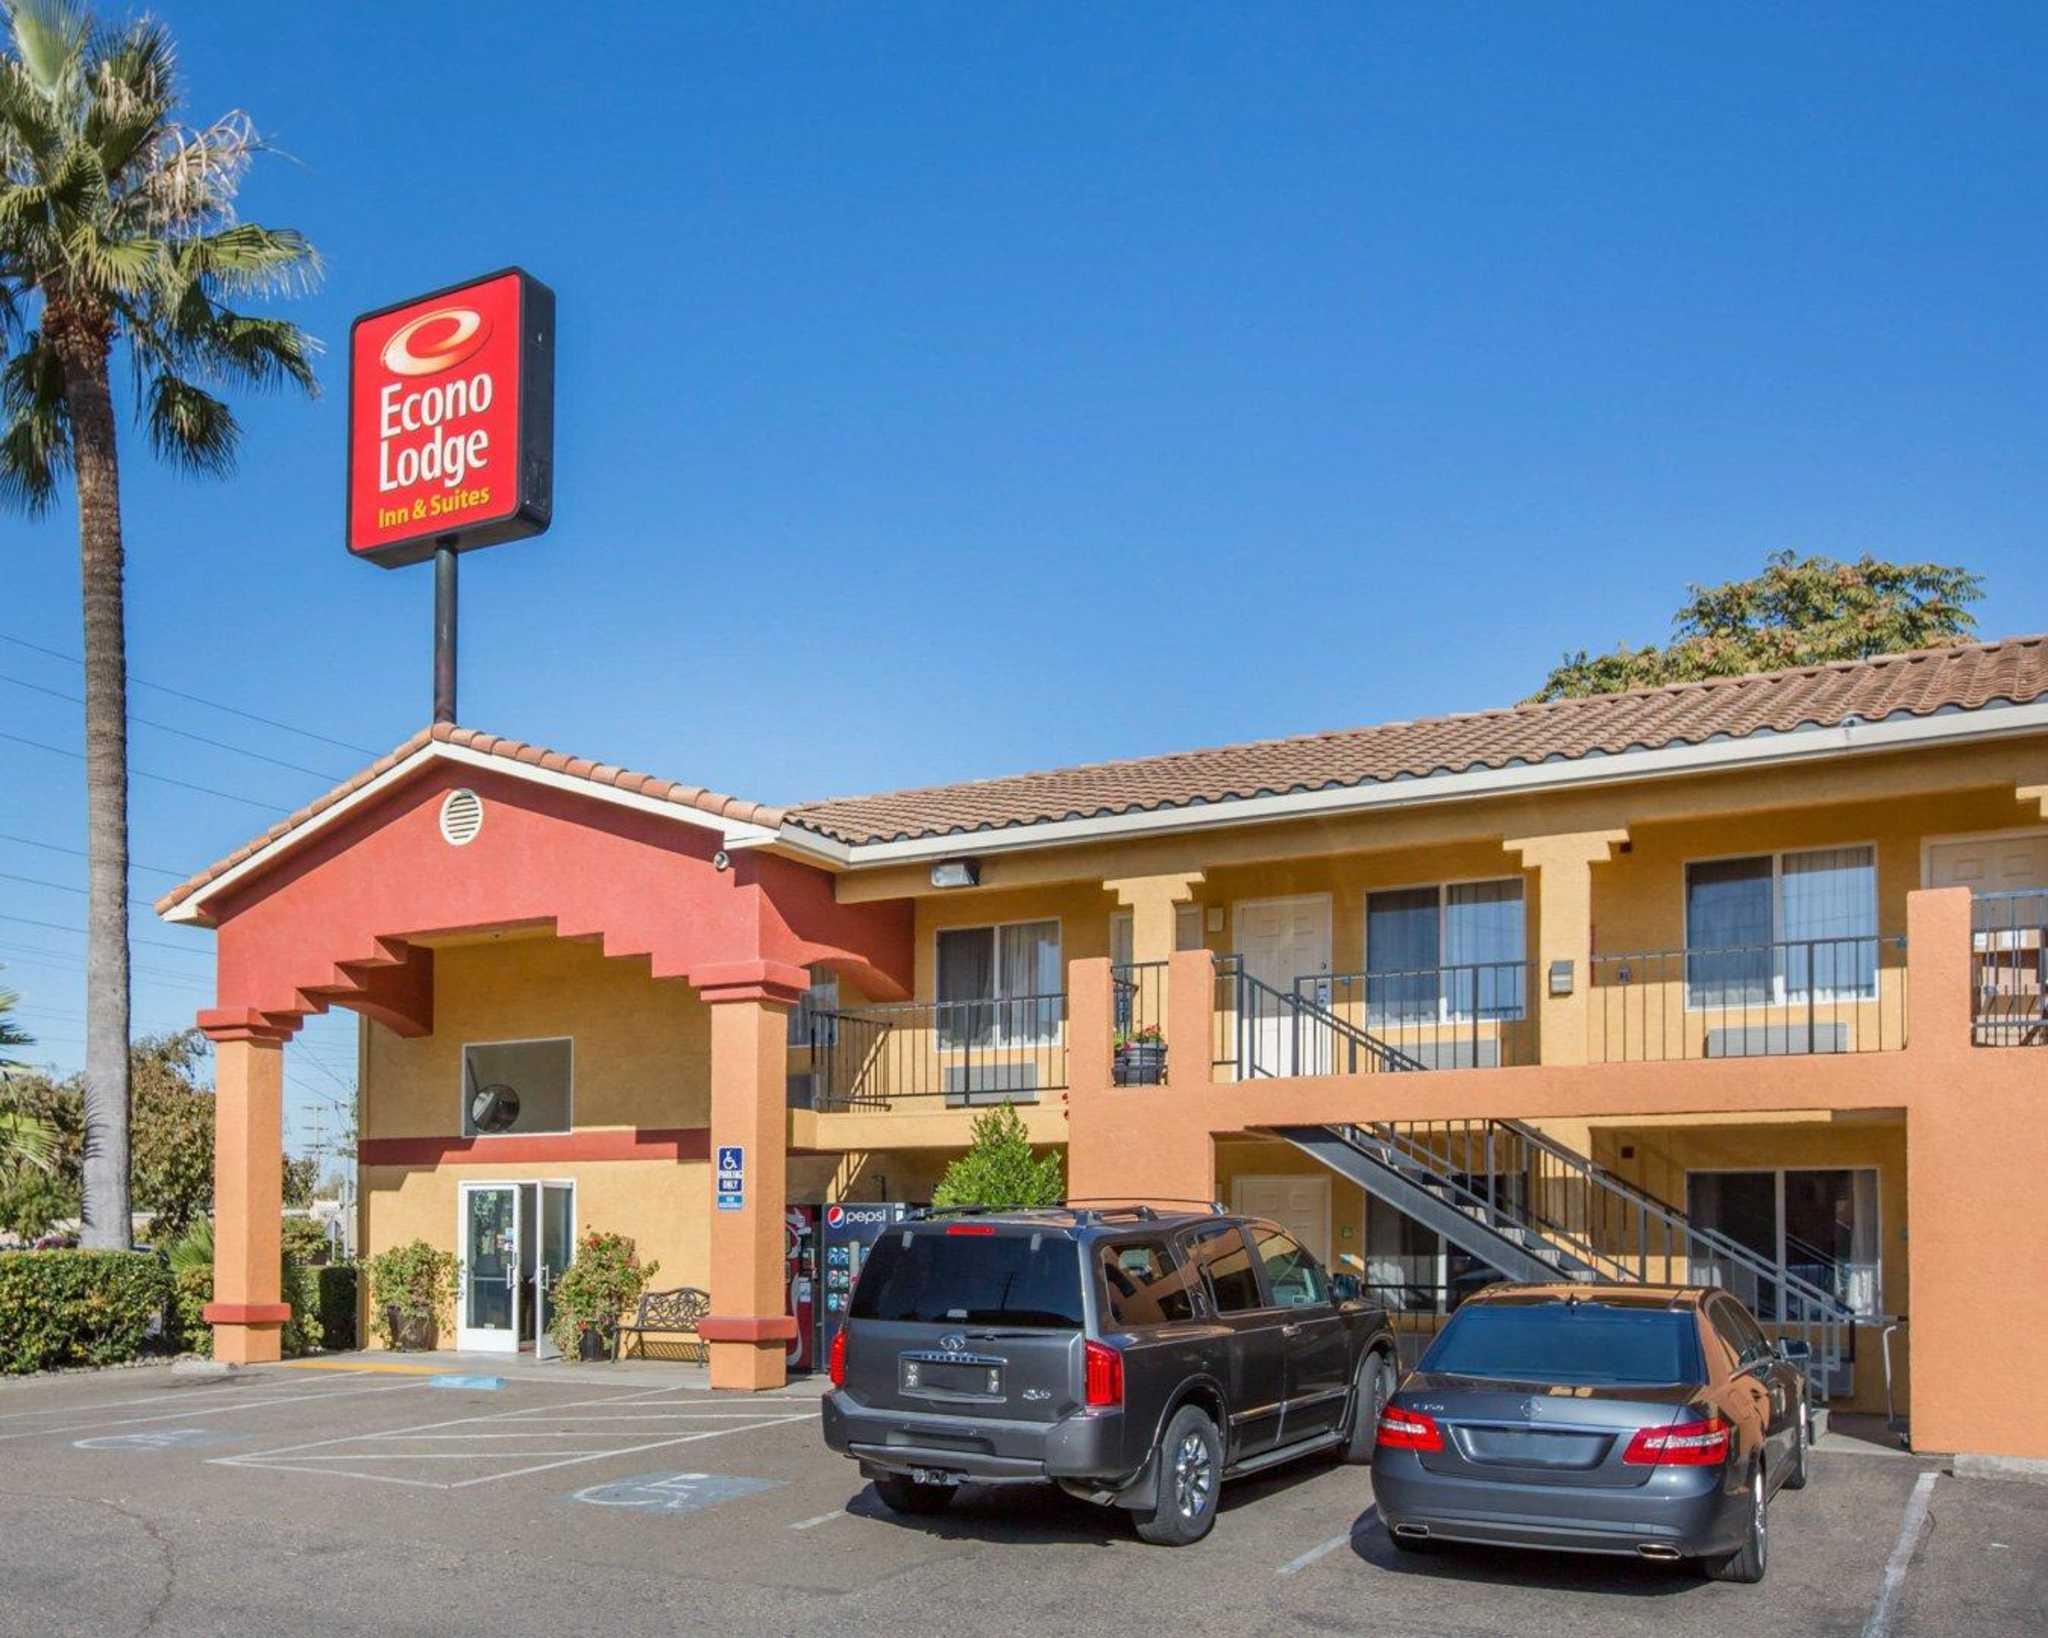 Econo Lodge Inn & Suites Lodi image 1